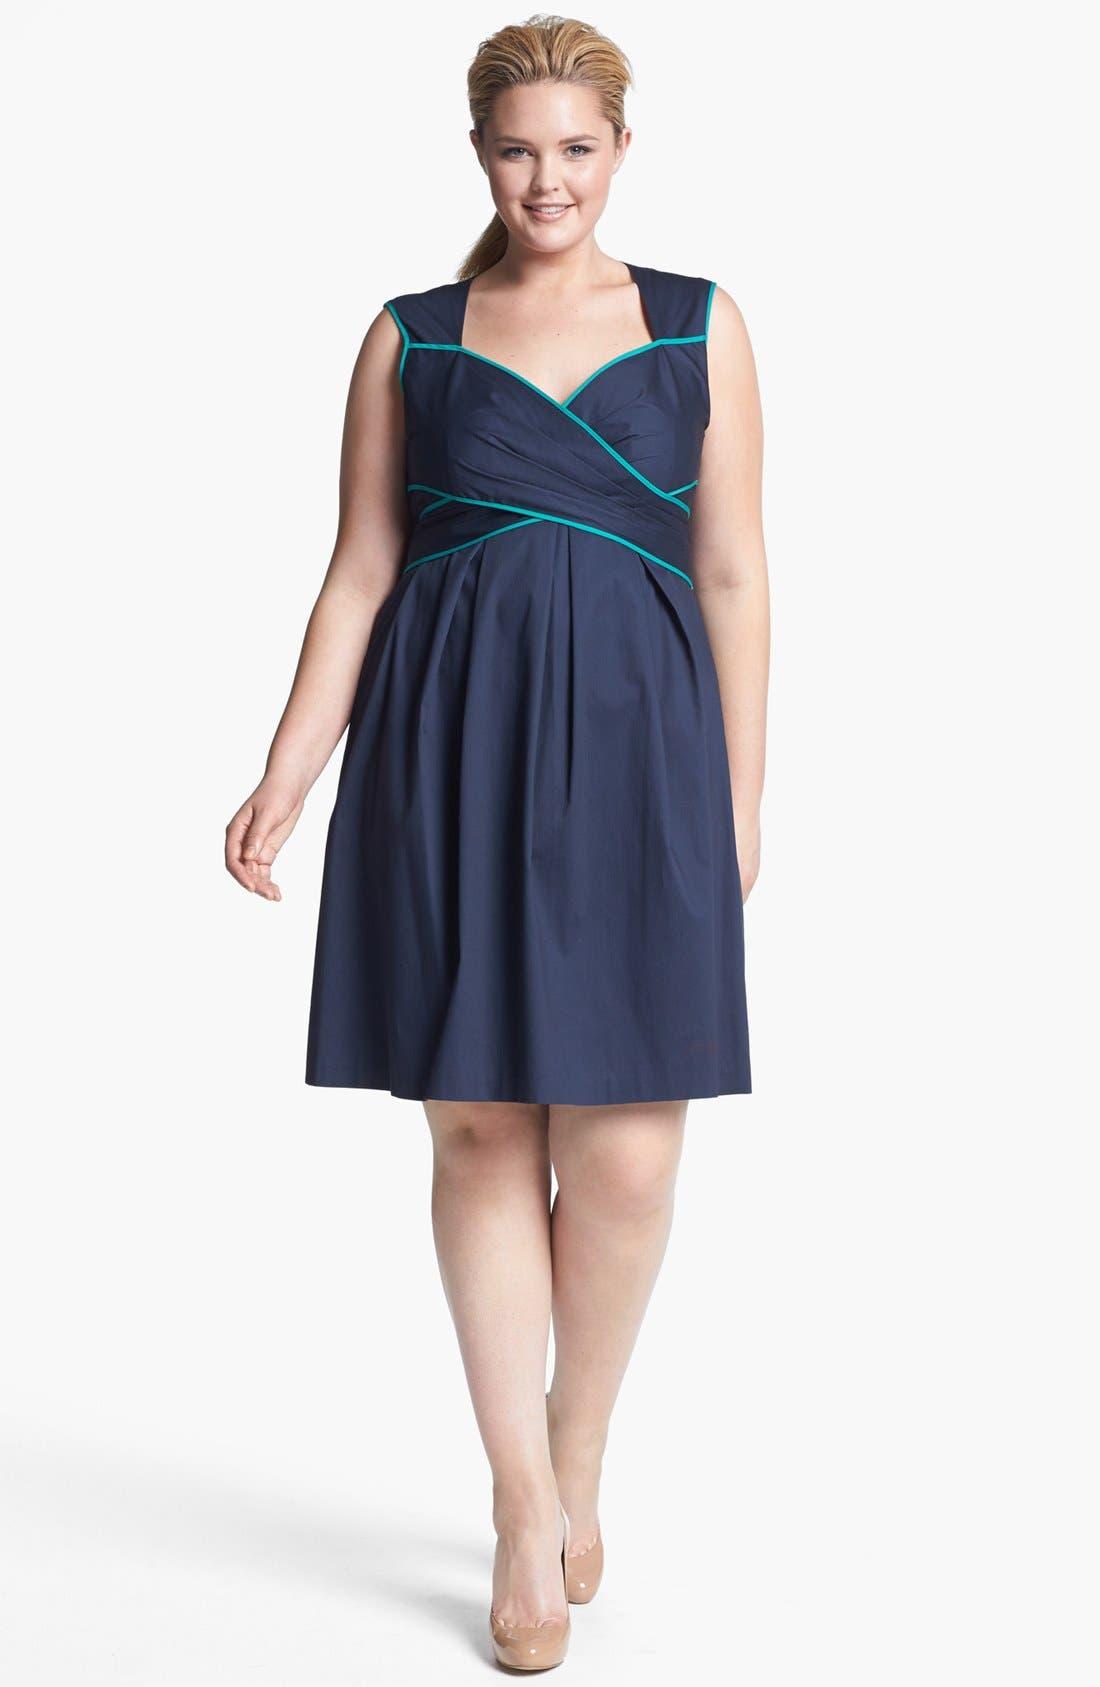 Main Image - Jessica Simpson Piped Cotton Sheath Dress (Plus Size)